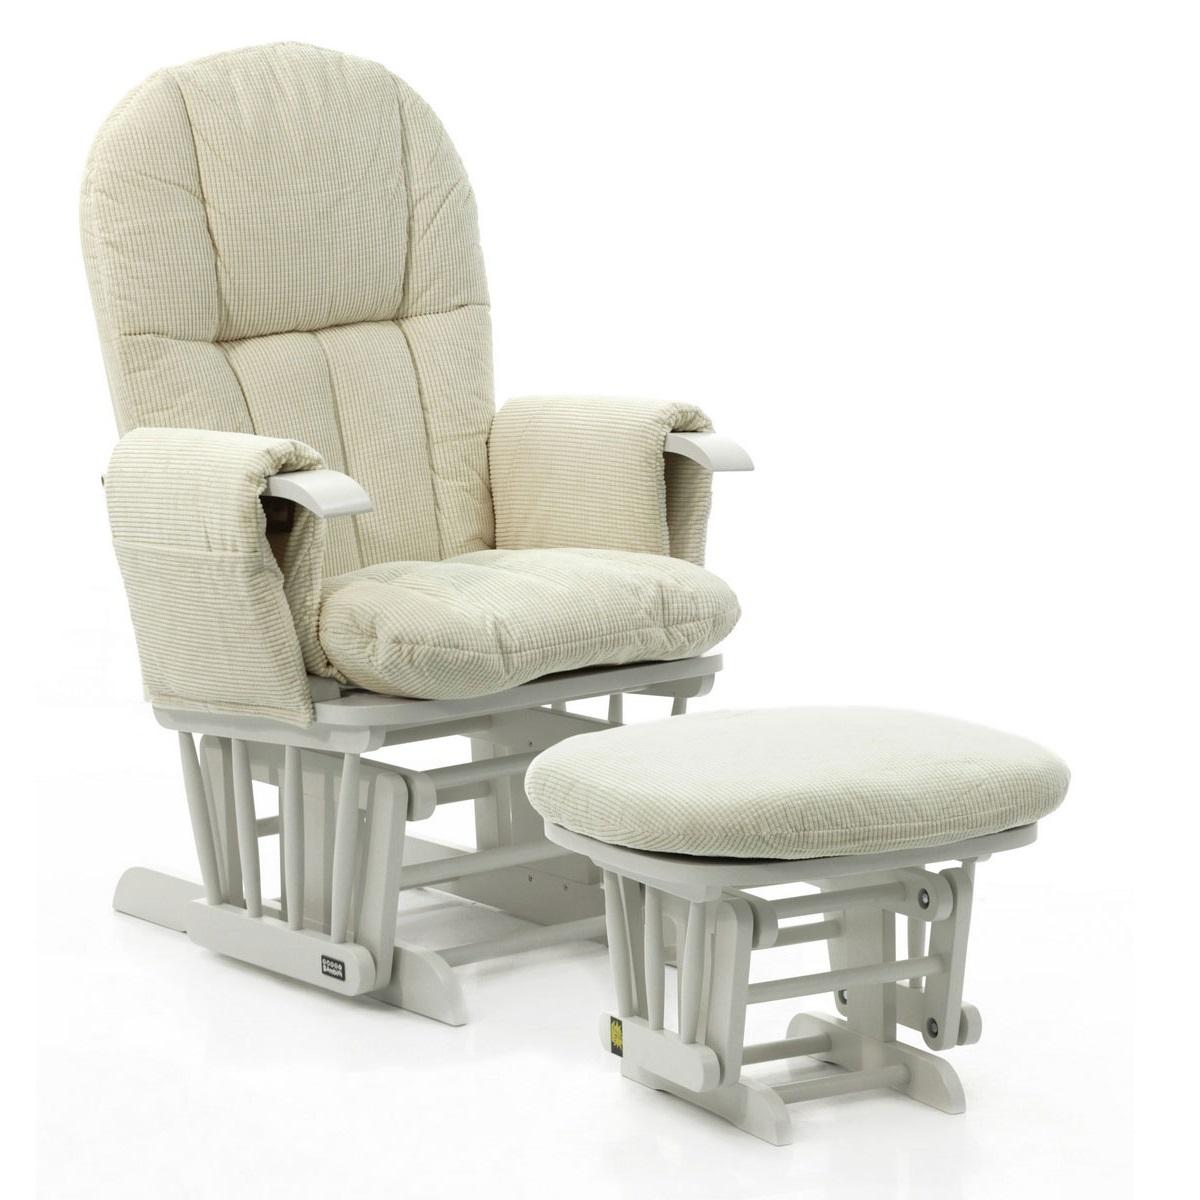 Кресло-качалка складная Tutti-Bambini Tutti Bambini Daisy GC35 Белое / крем